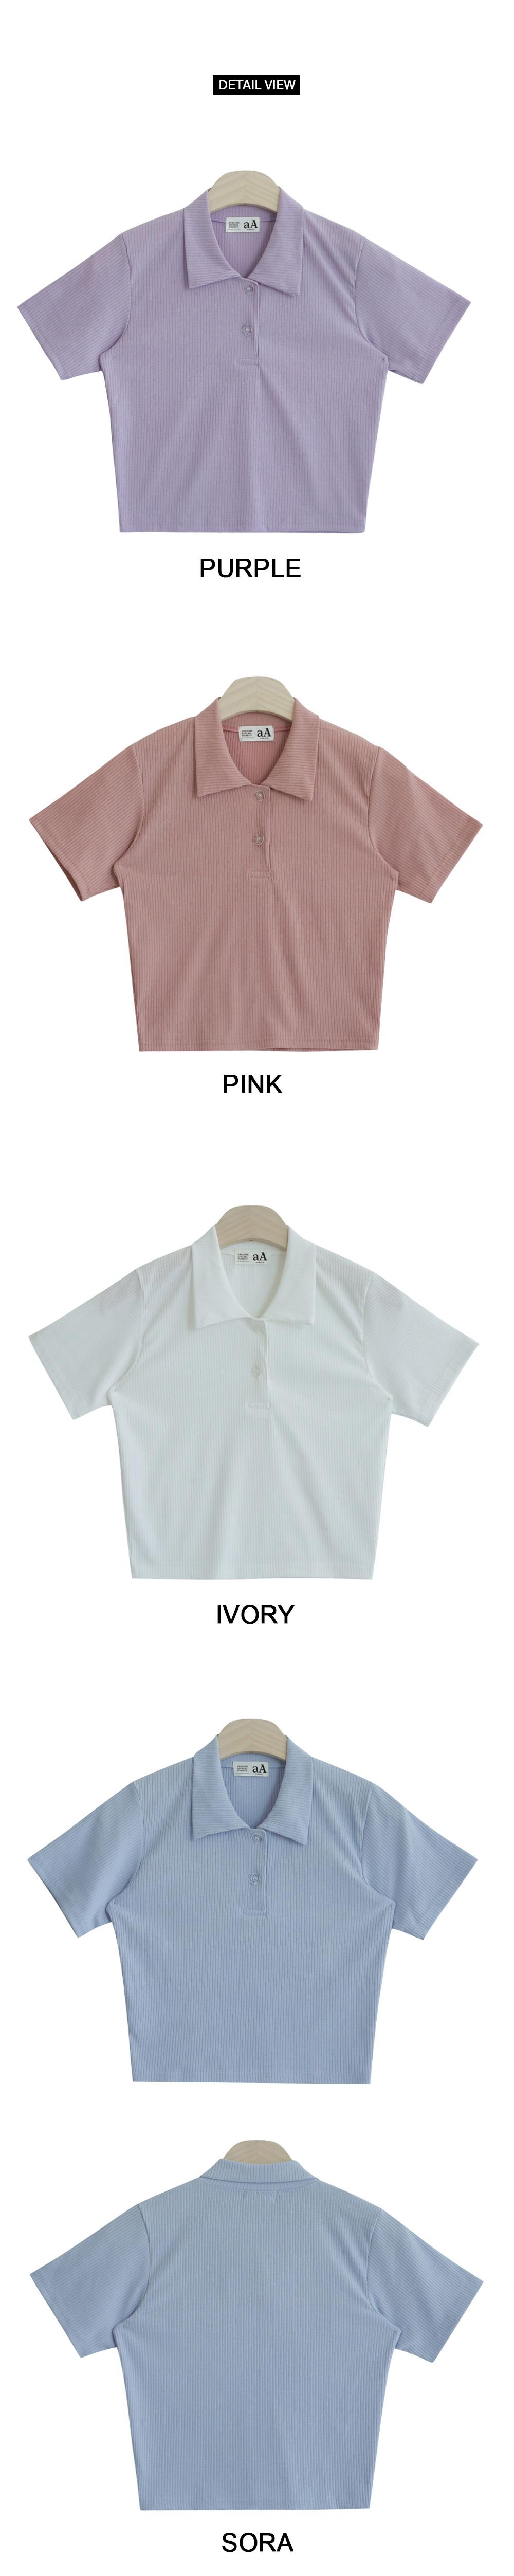 BASIC COLOR T-SHIRTS